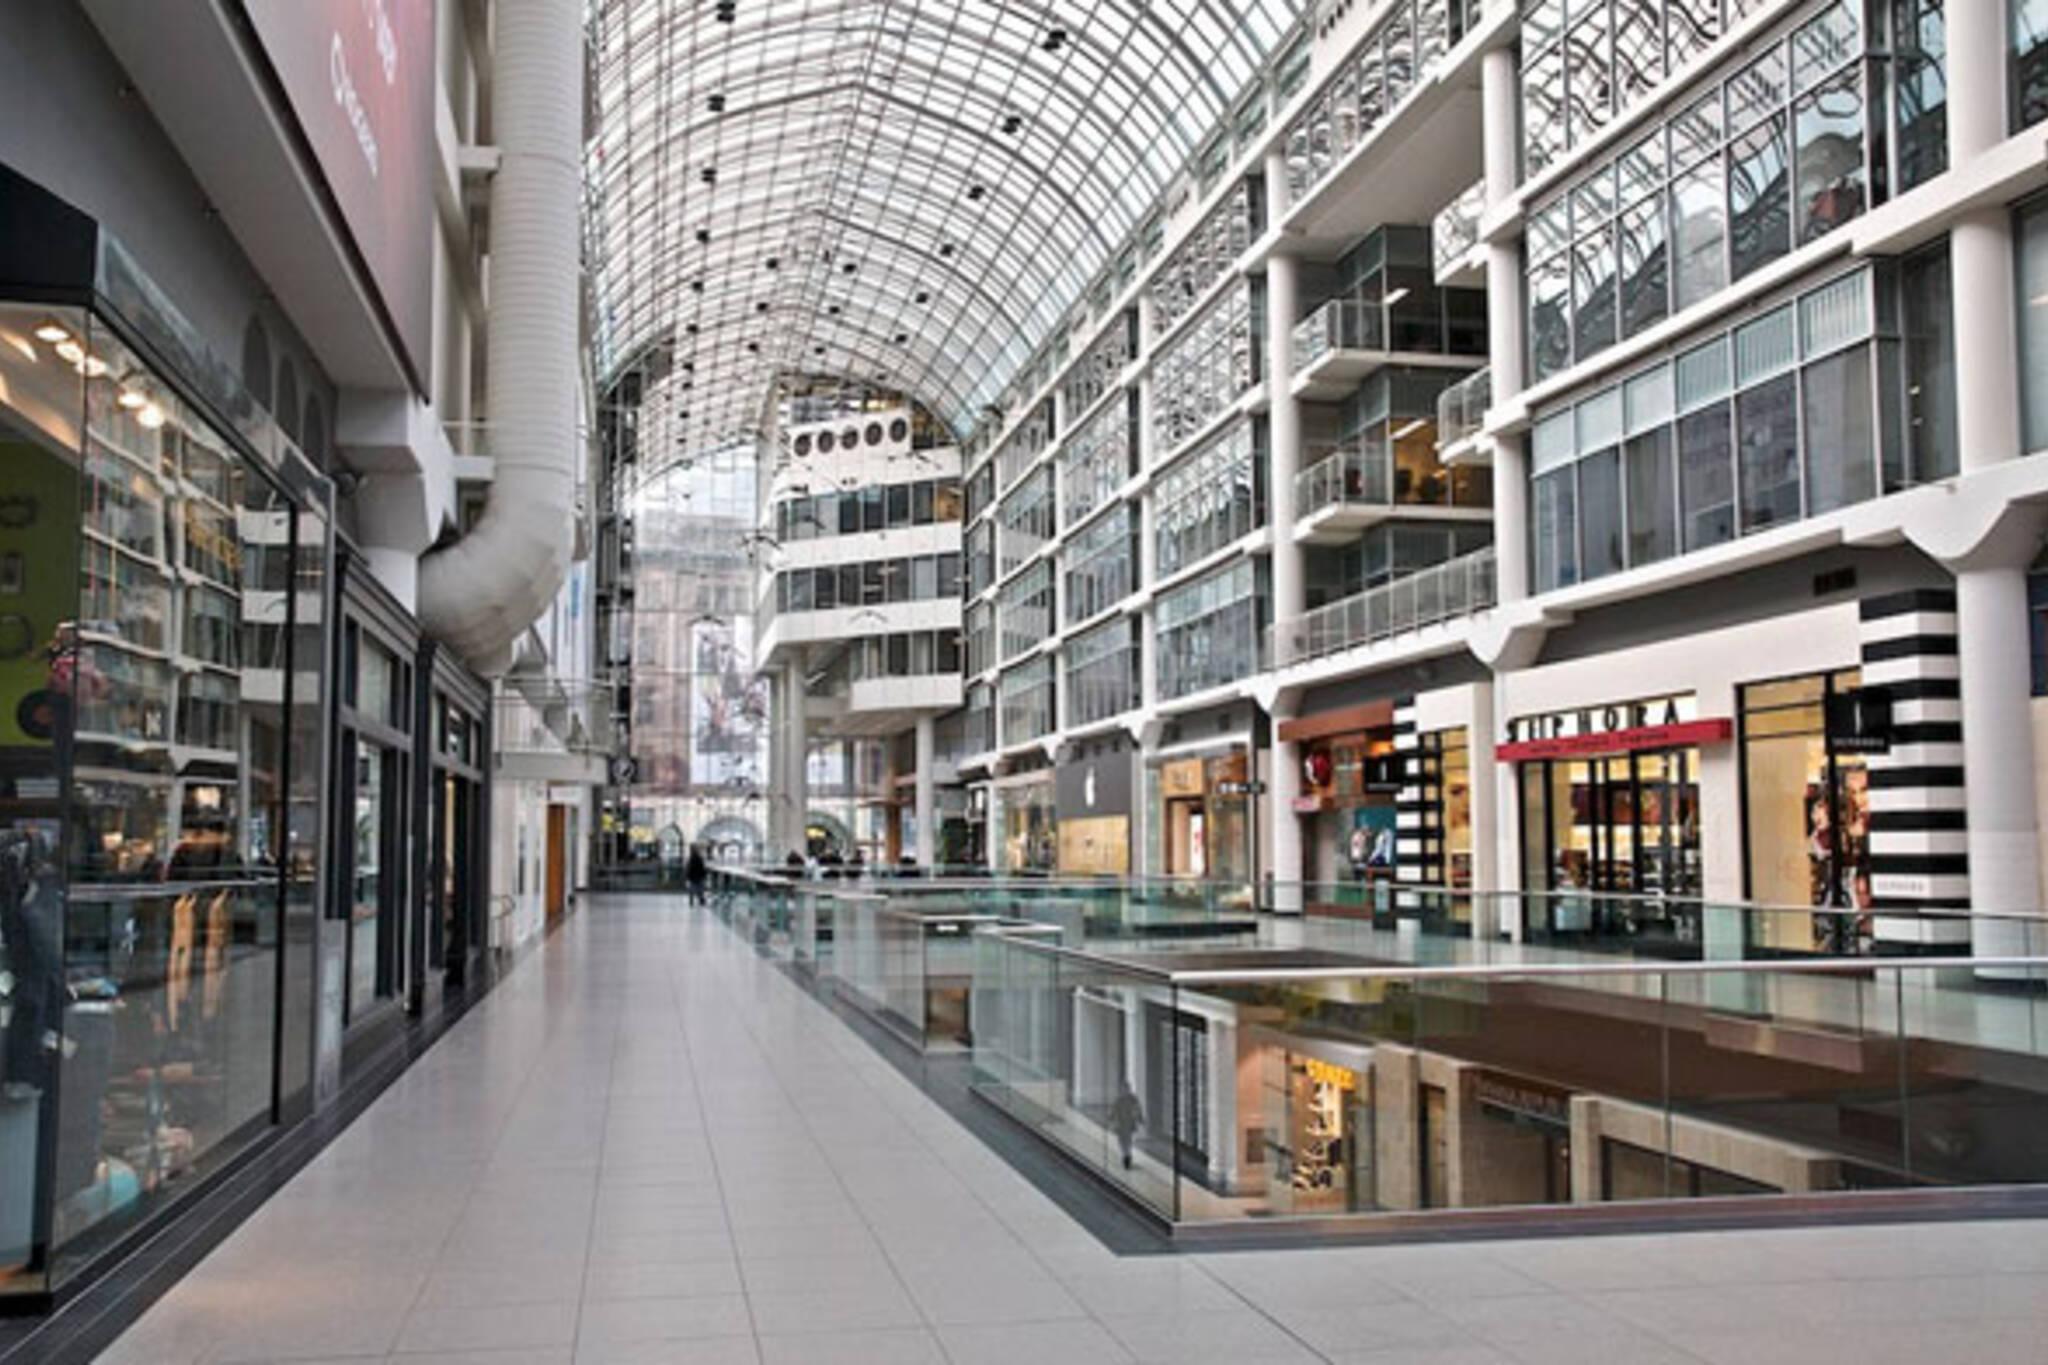 7dda7eafa31 Toronto Eaton Centre to be renamed